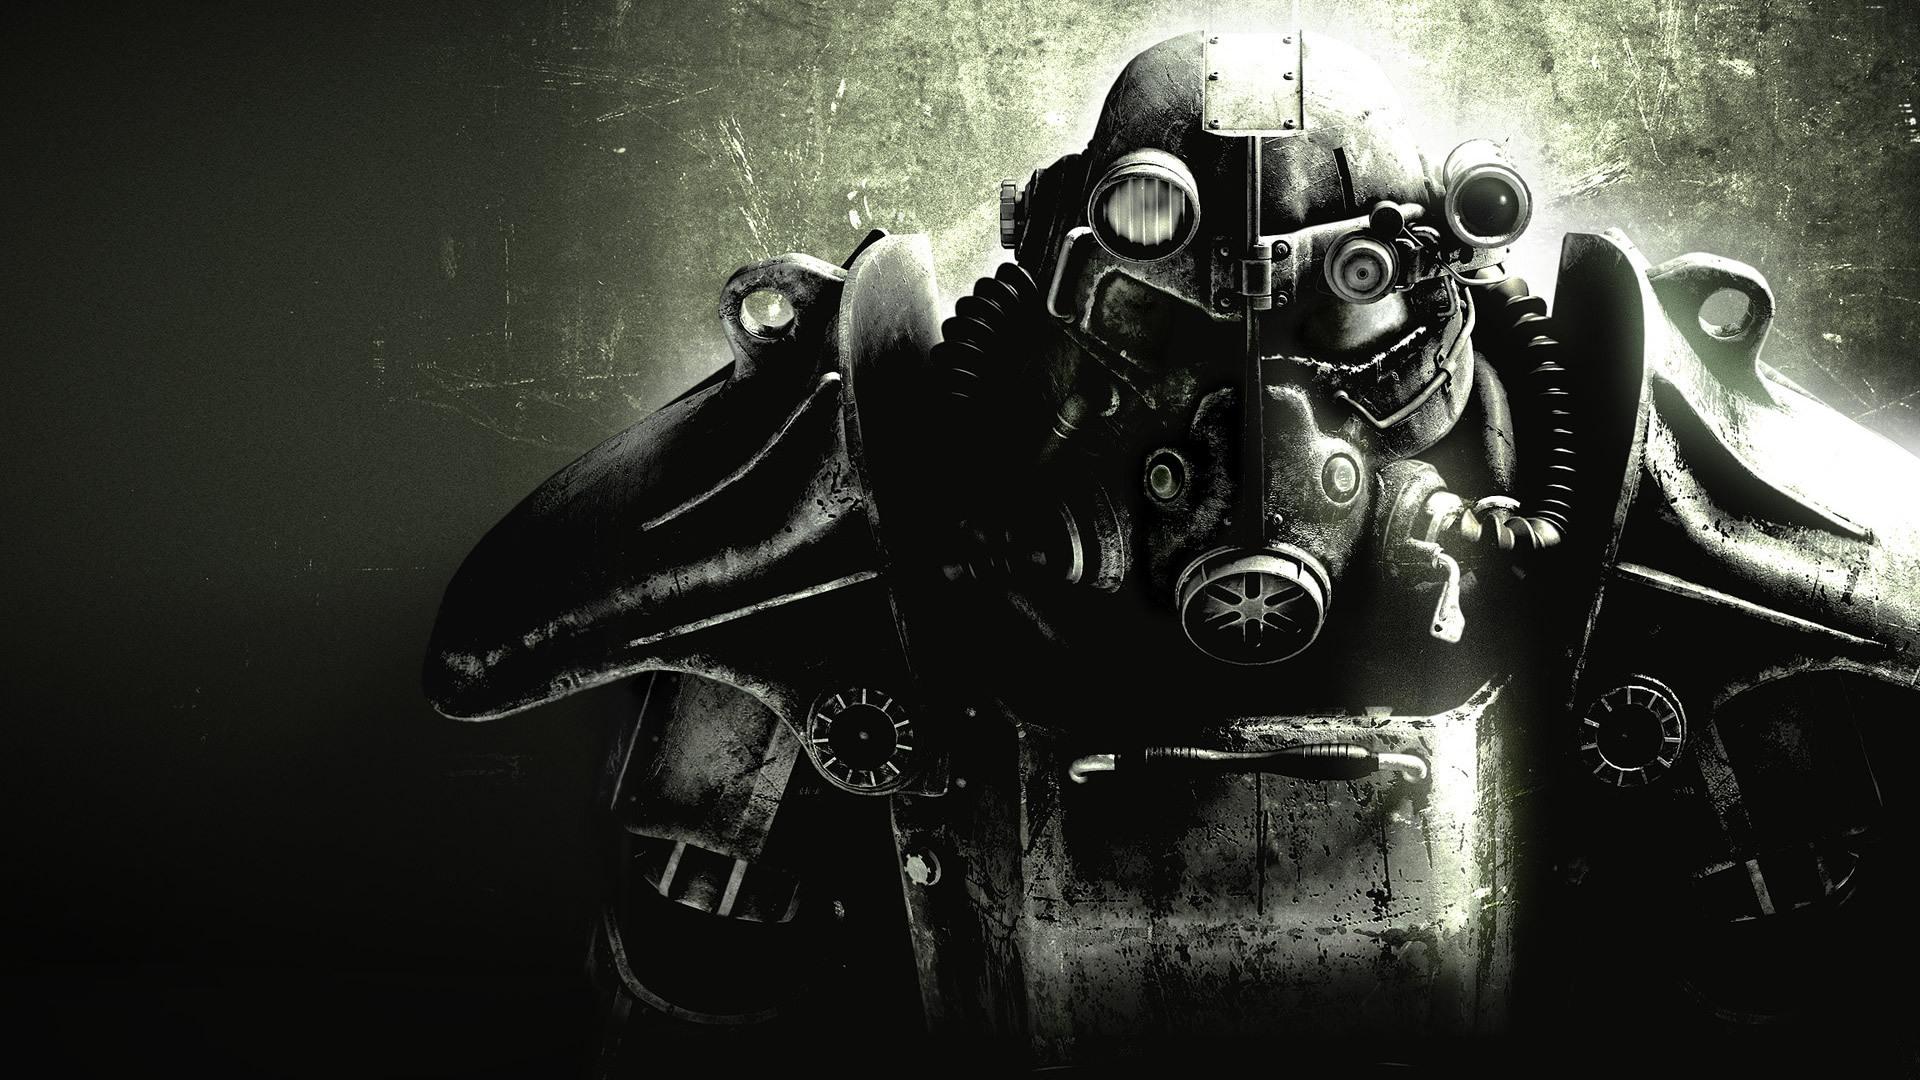 Fallout 3 pic